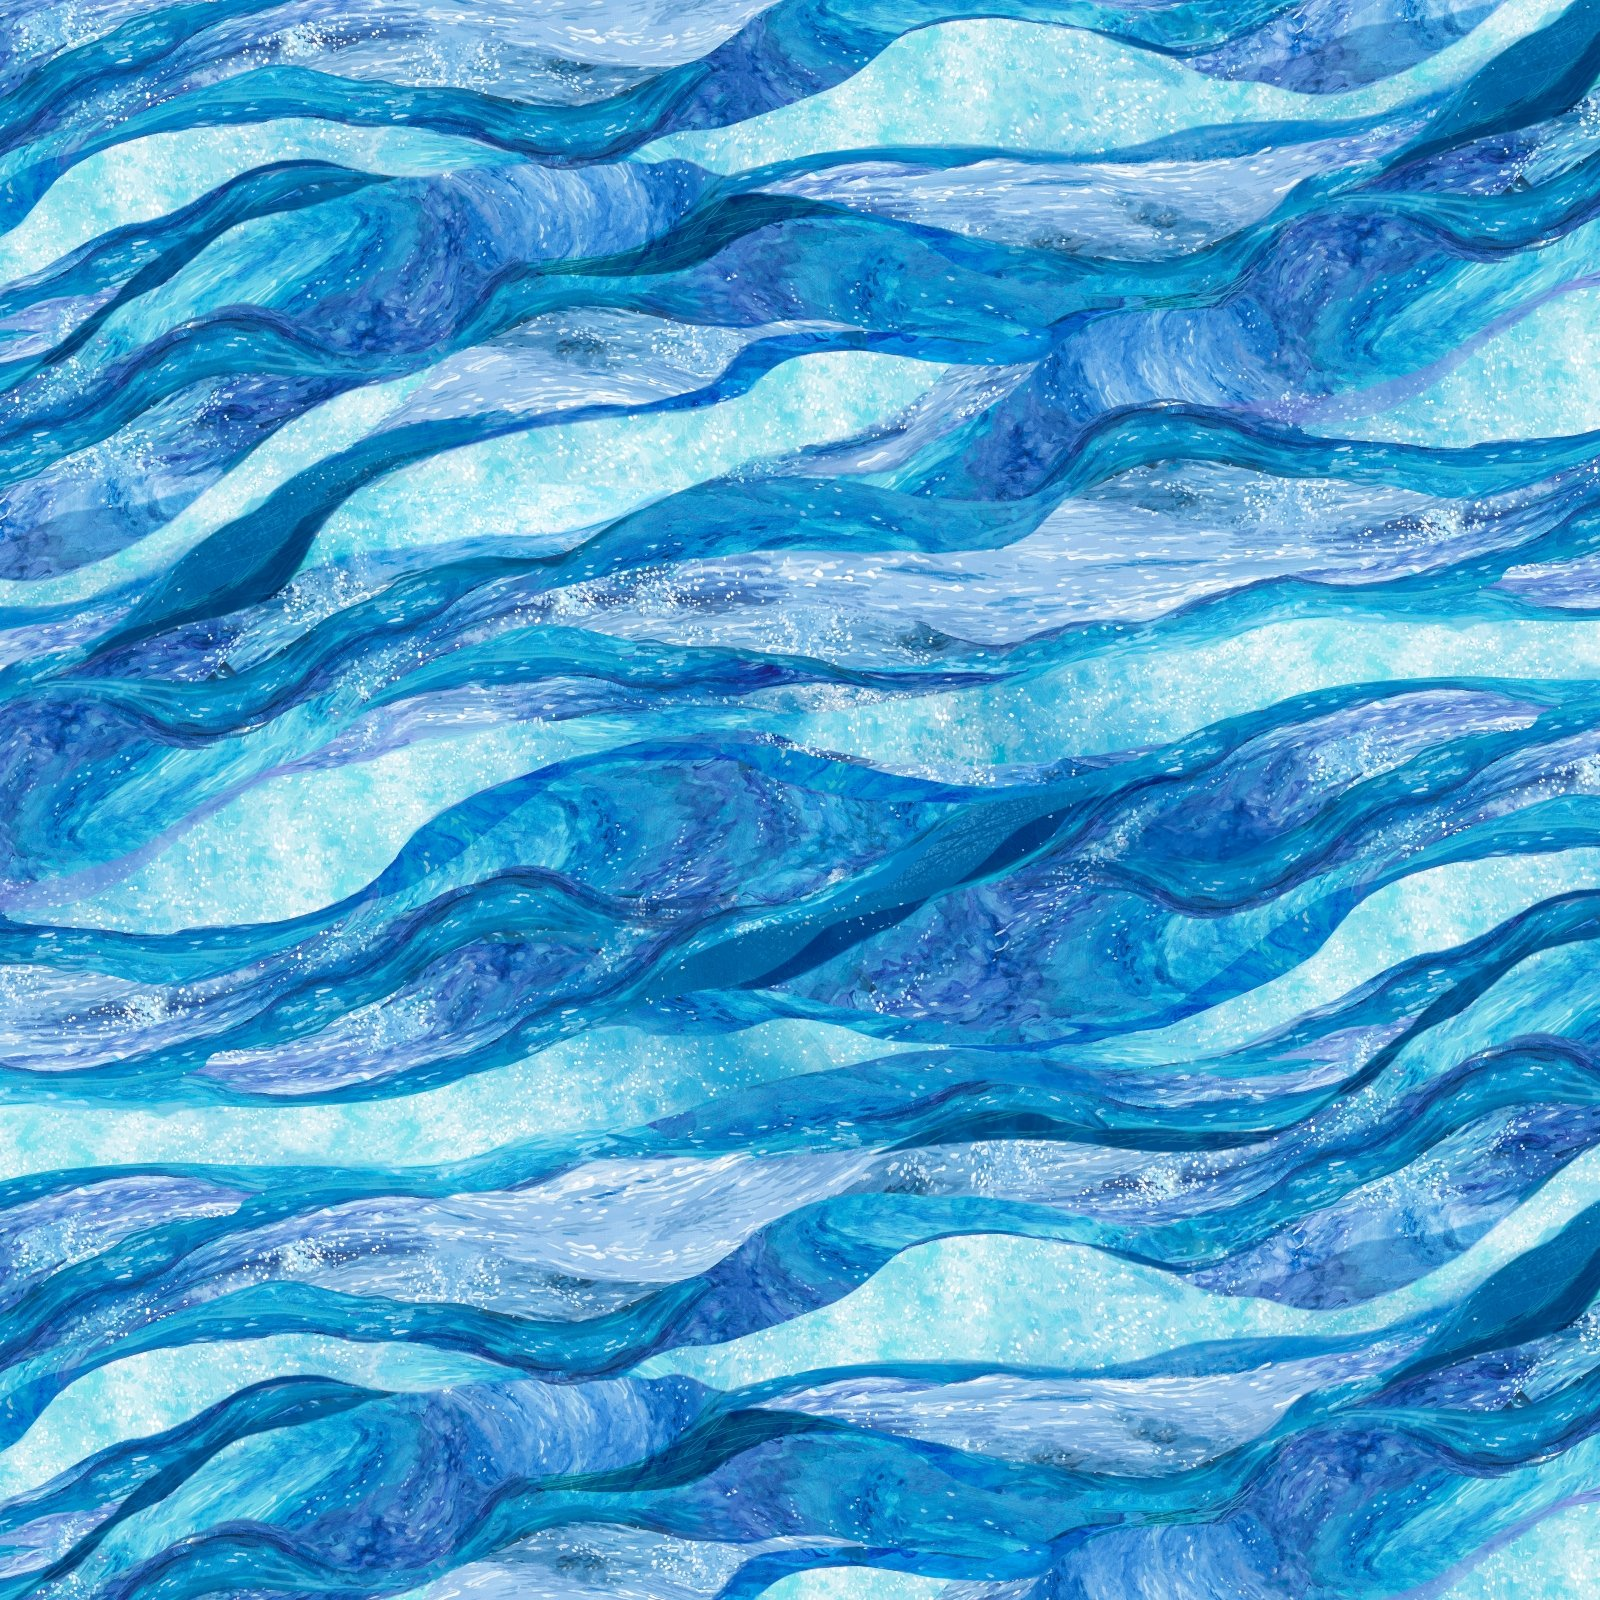 WPAR-4583 B - WEEKEND IN PARADISE BY ABRAHAM HUNTER OCEAN - ARRIVING IN OCTOBER 2021